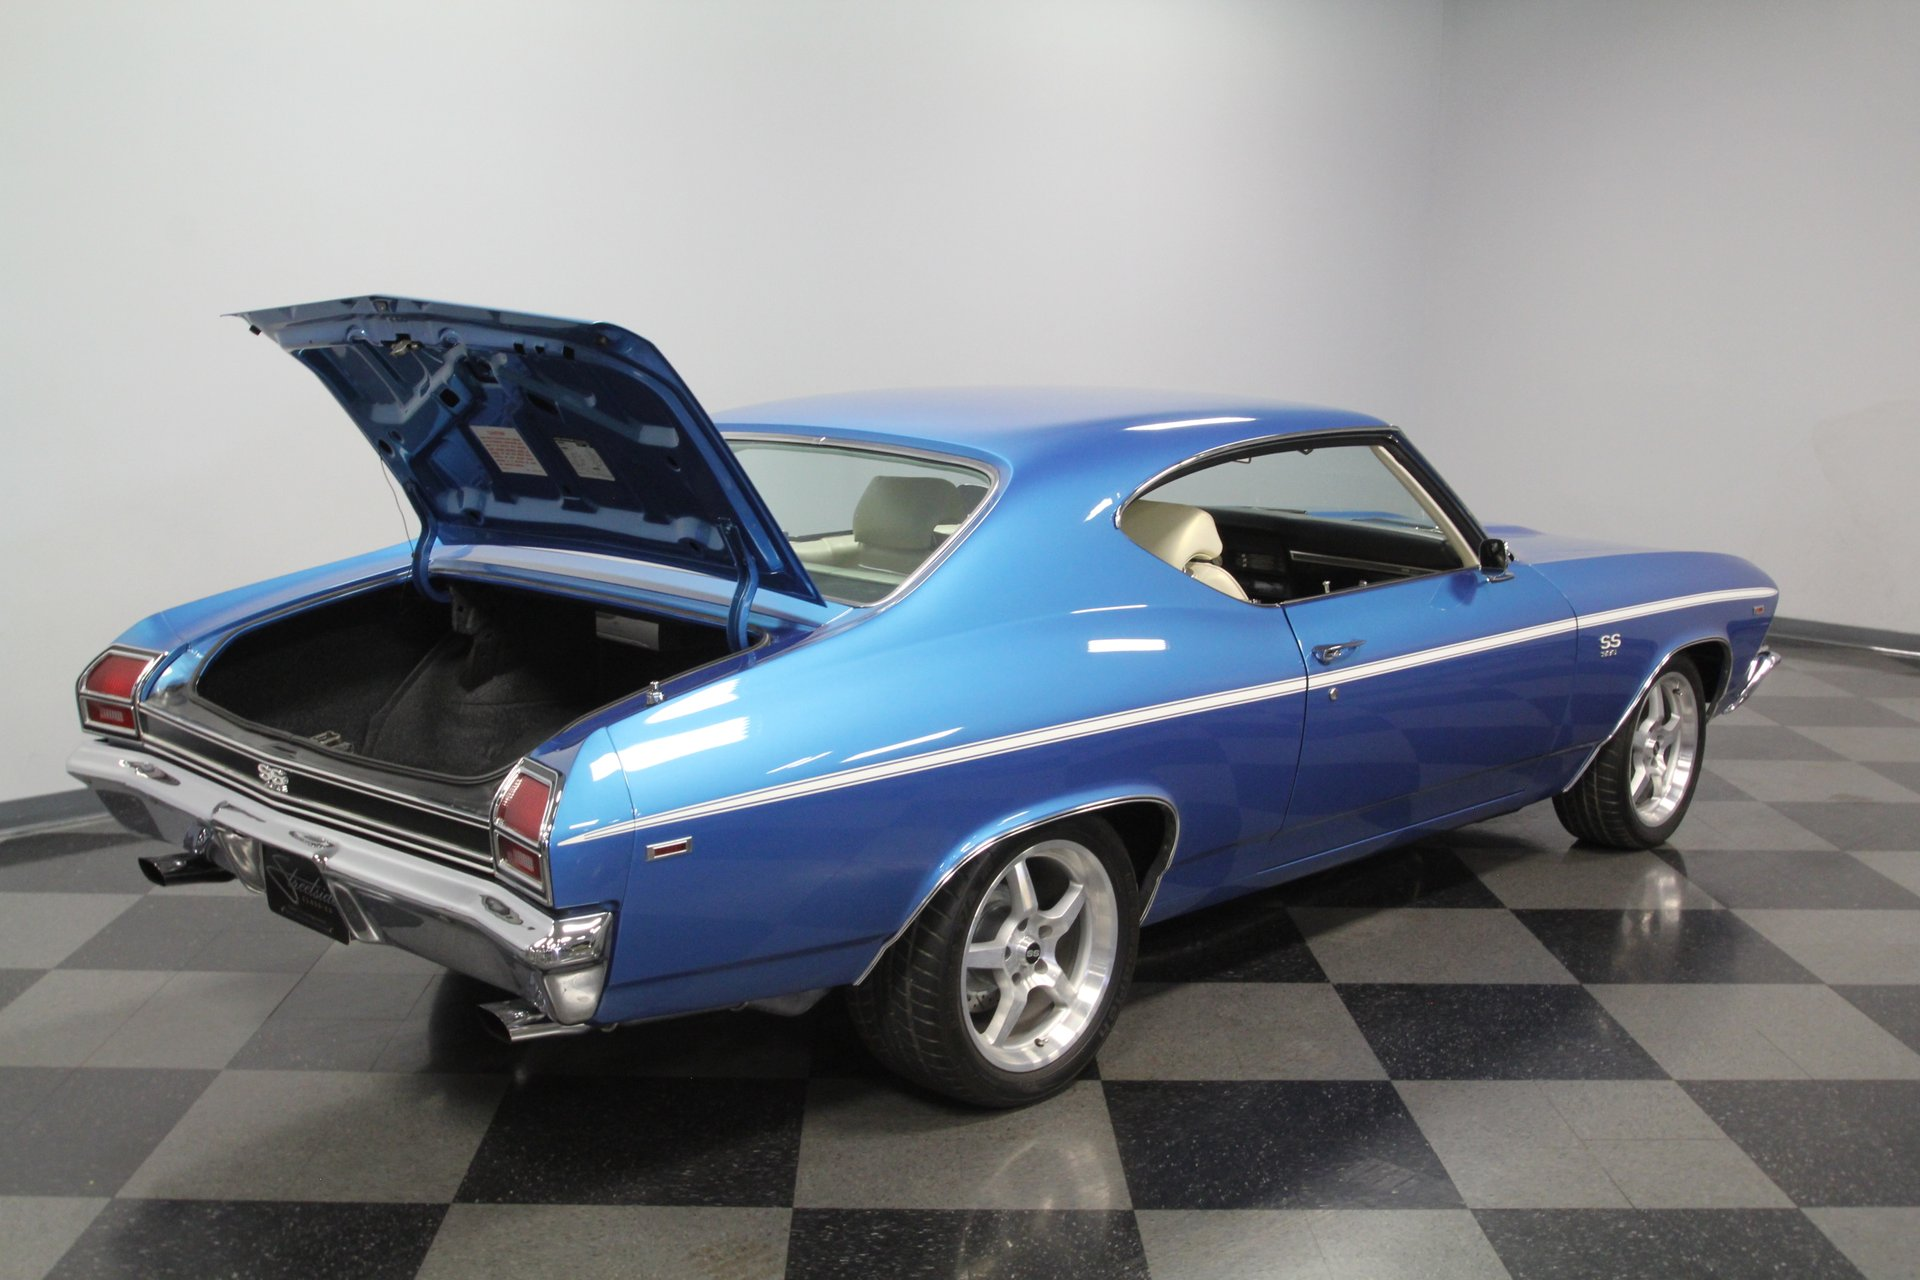 1969 Chevrolet Chevelle | Streetside Classics - The Nation's